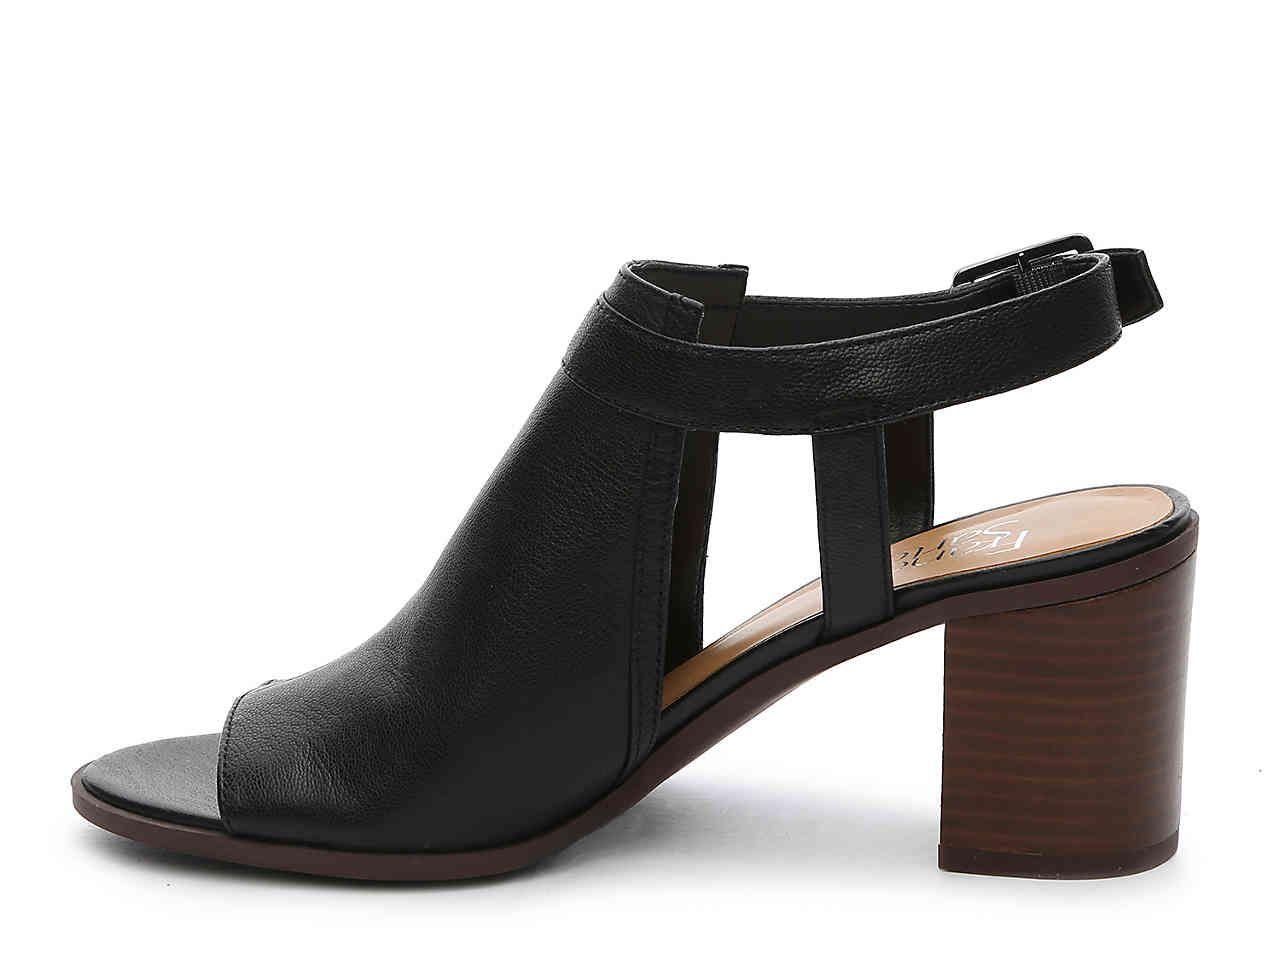 85e6dcd52d81 Franco Sarto Harlet Sandal Women s Shoes